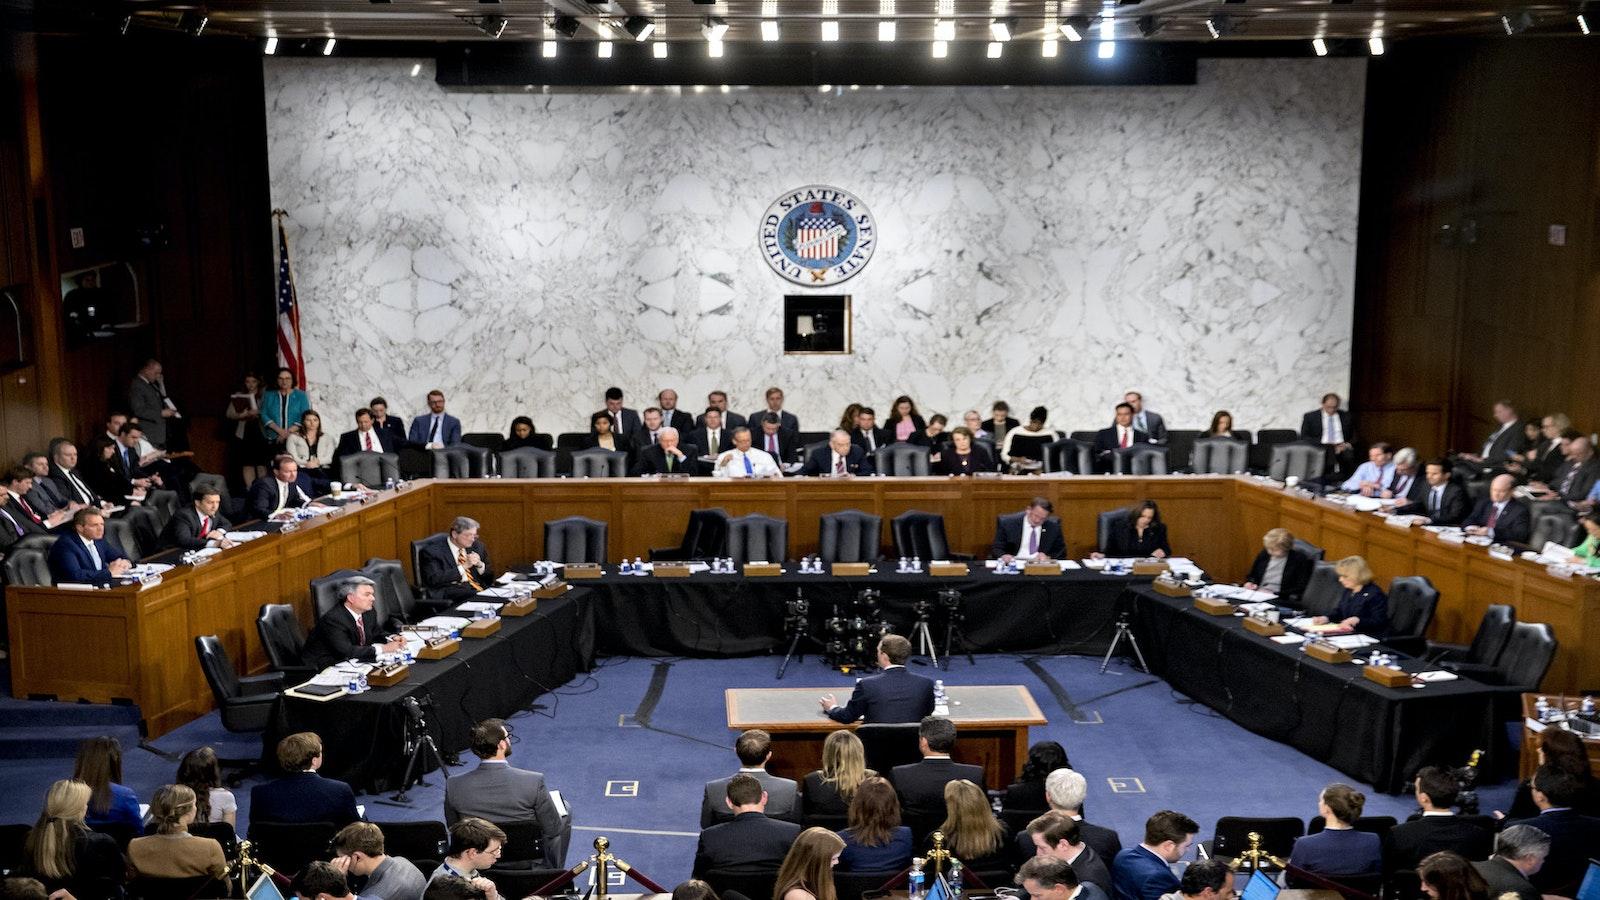 Facebook CEO Mark Zuckerberg testifies before Congress last April. Photo by Bloomberg.